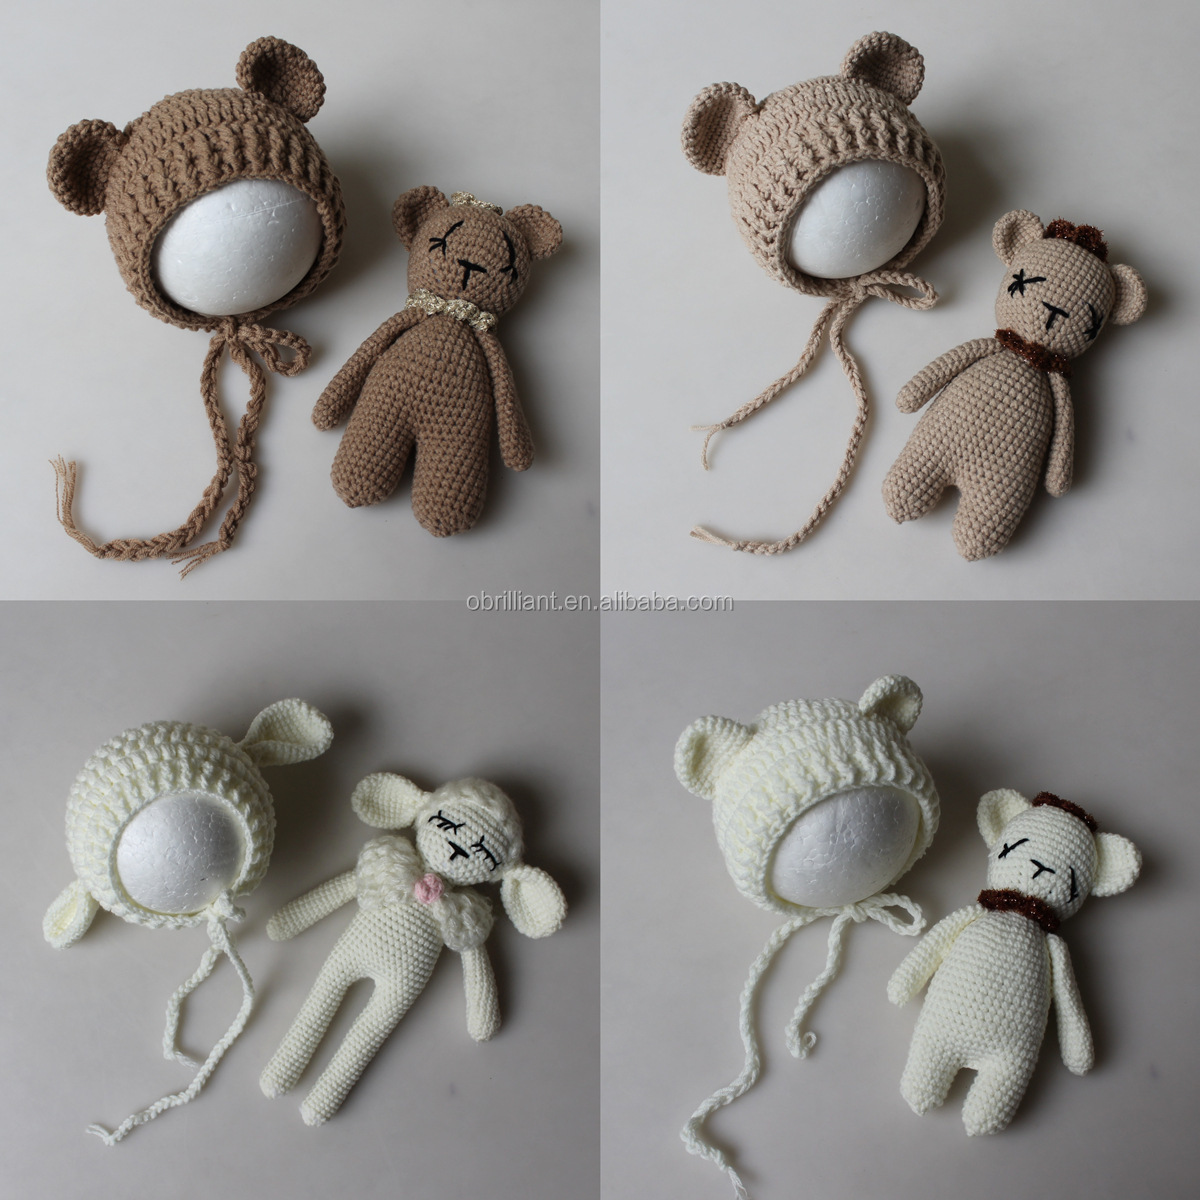 Sleeping Baby Amigurumi Pattern, Sleepy Doll Crochet Pattern, baby ... | 1200x1200